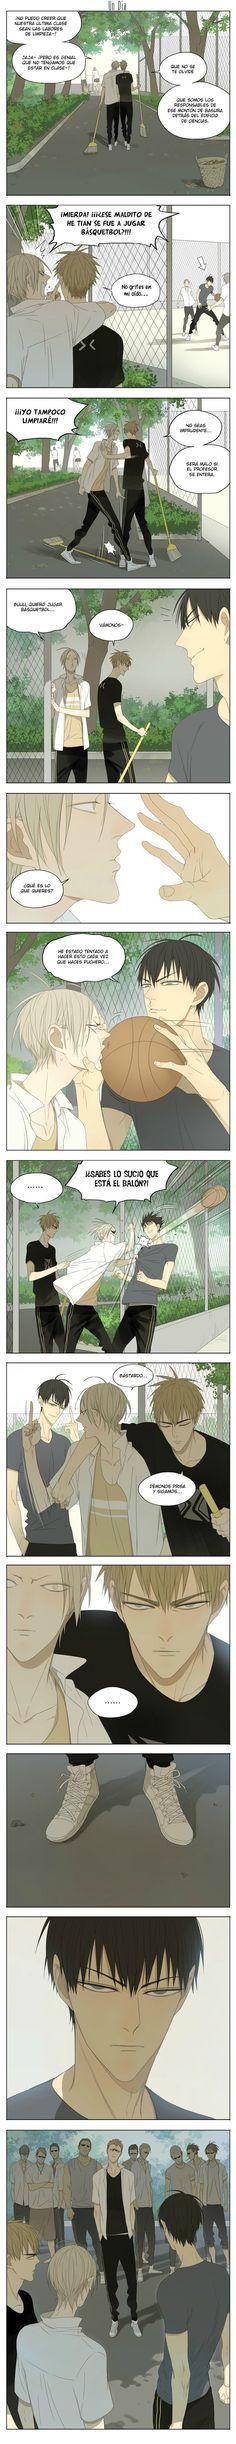 19 Days Capítulo 9 página 9 - Leer Manga en Español gratis en NineManga.com